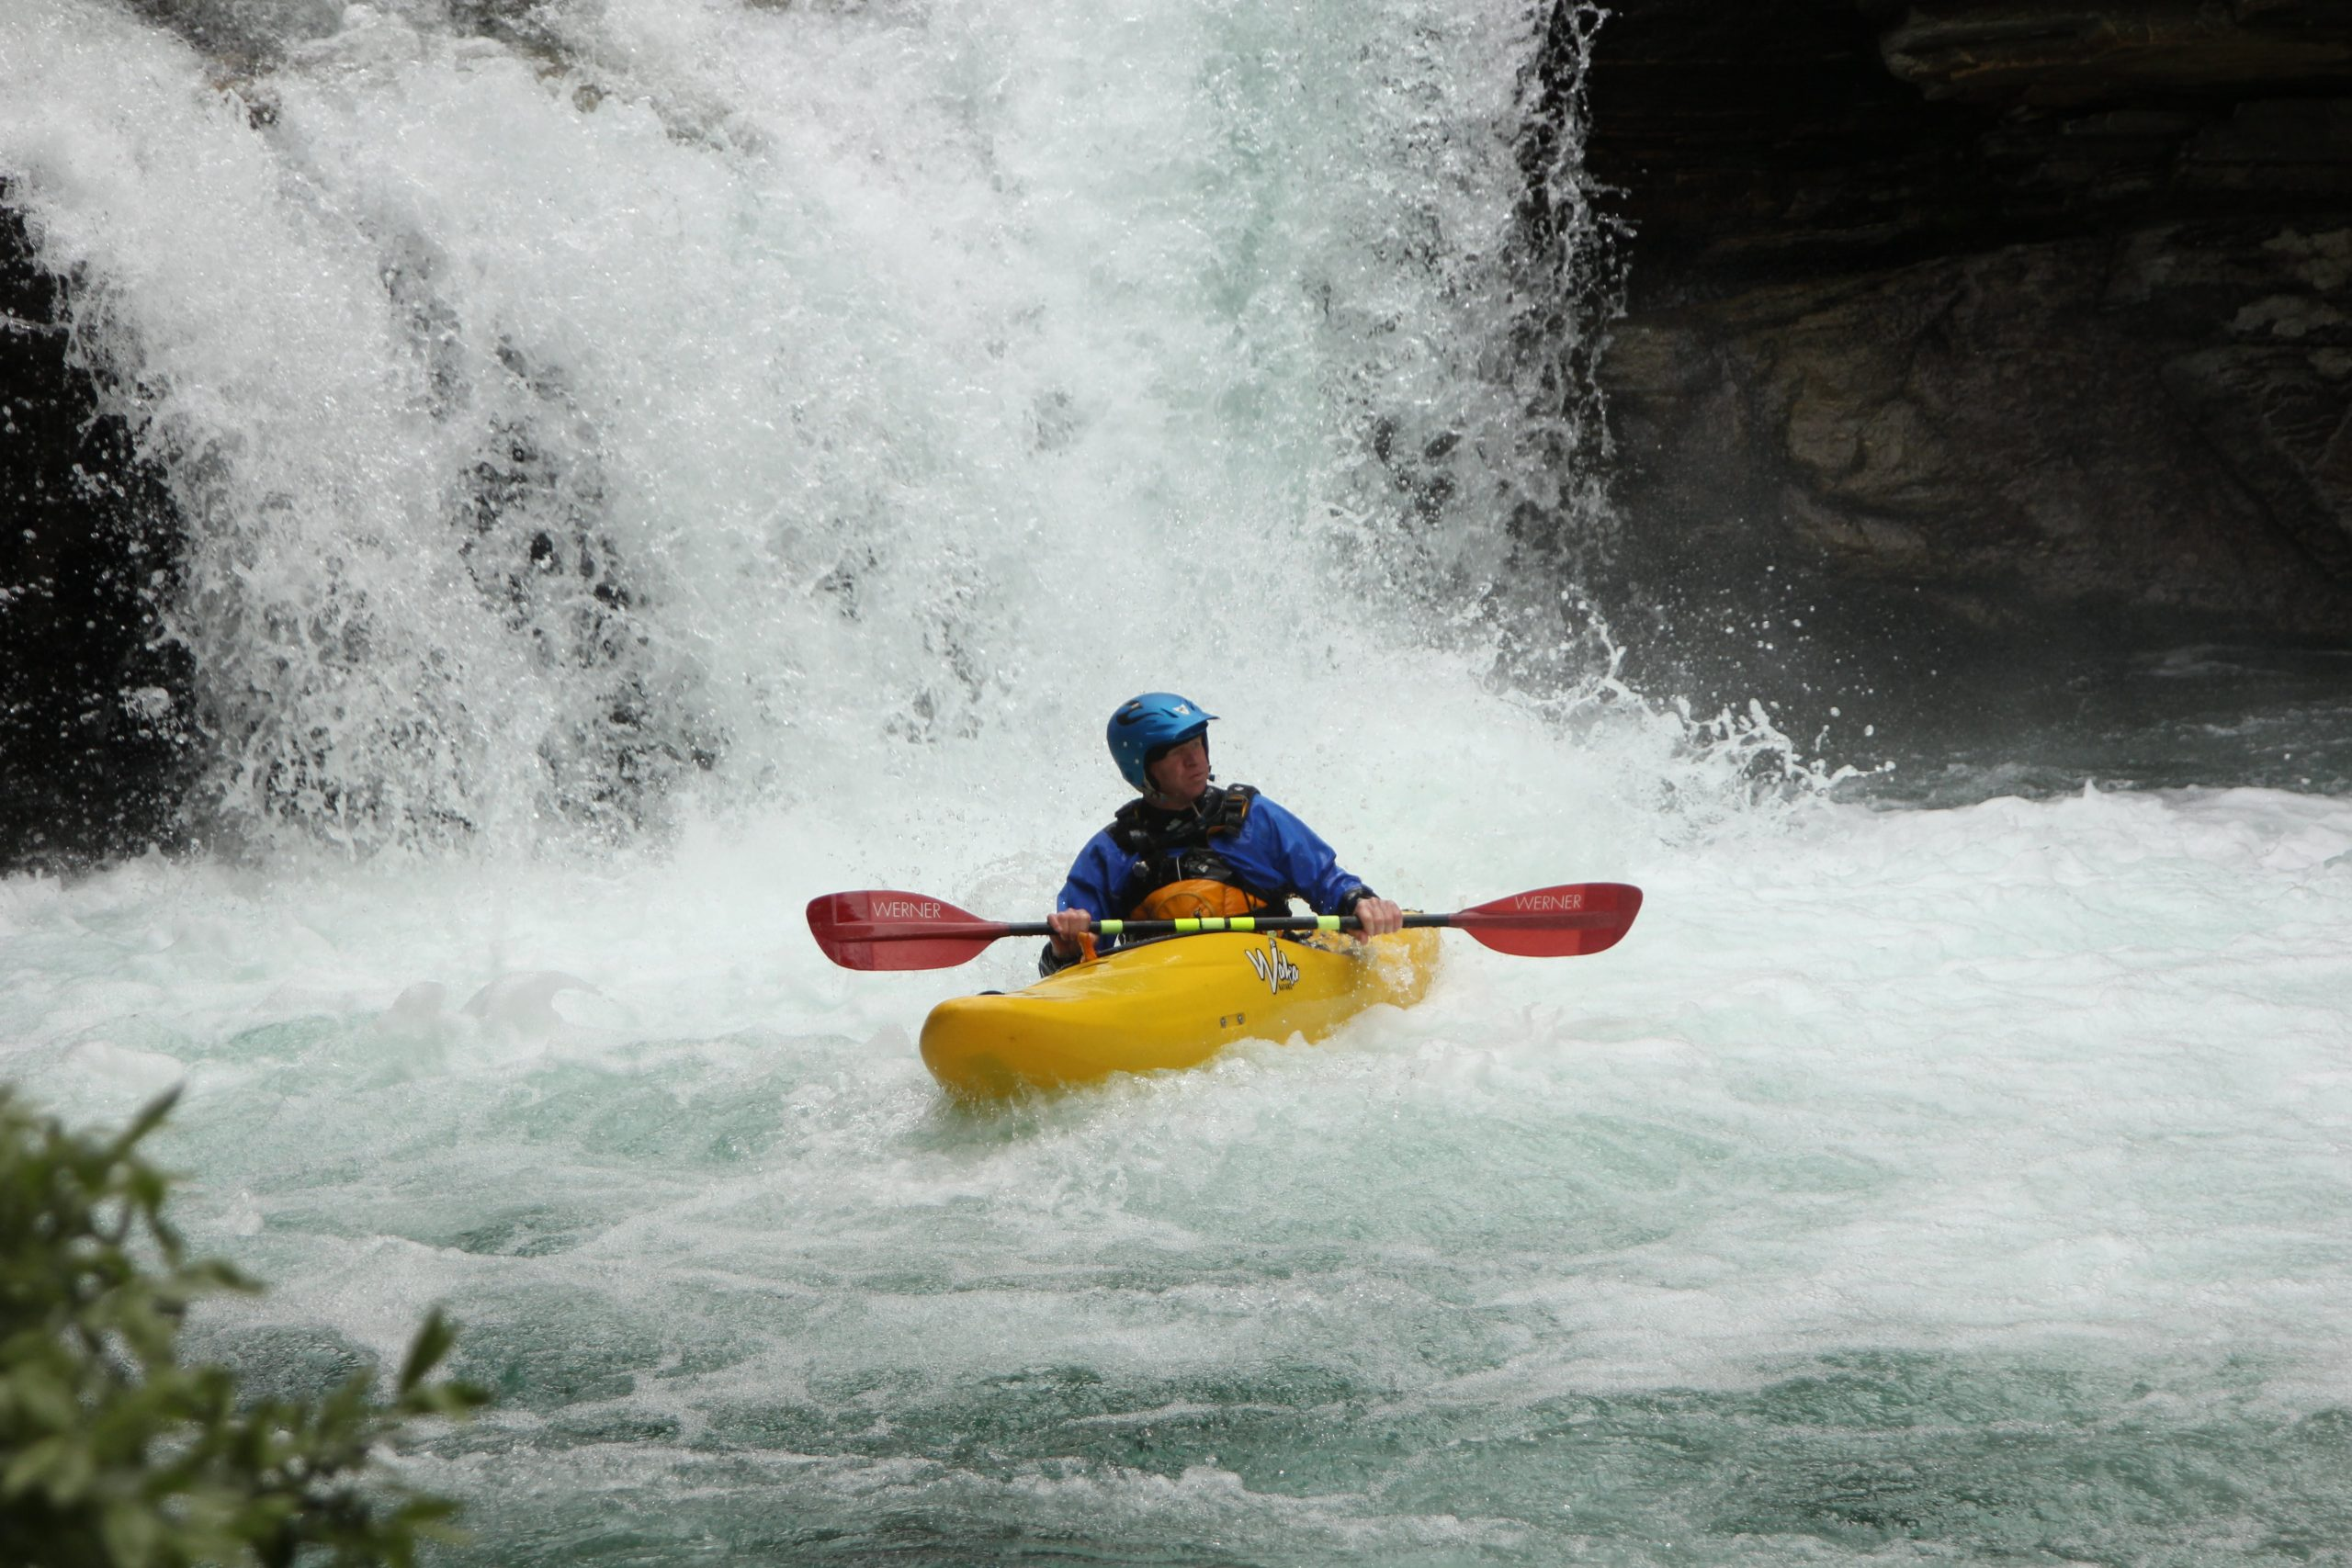 dove fare kayak in piemonte